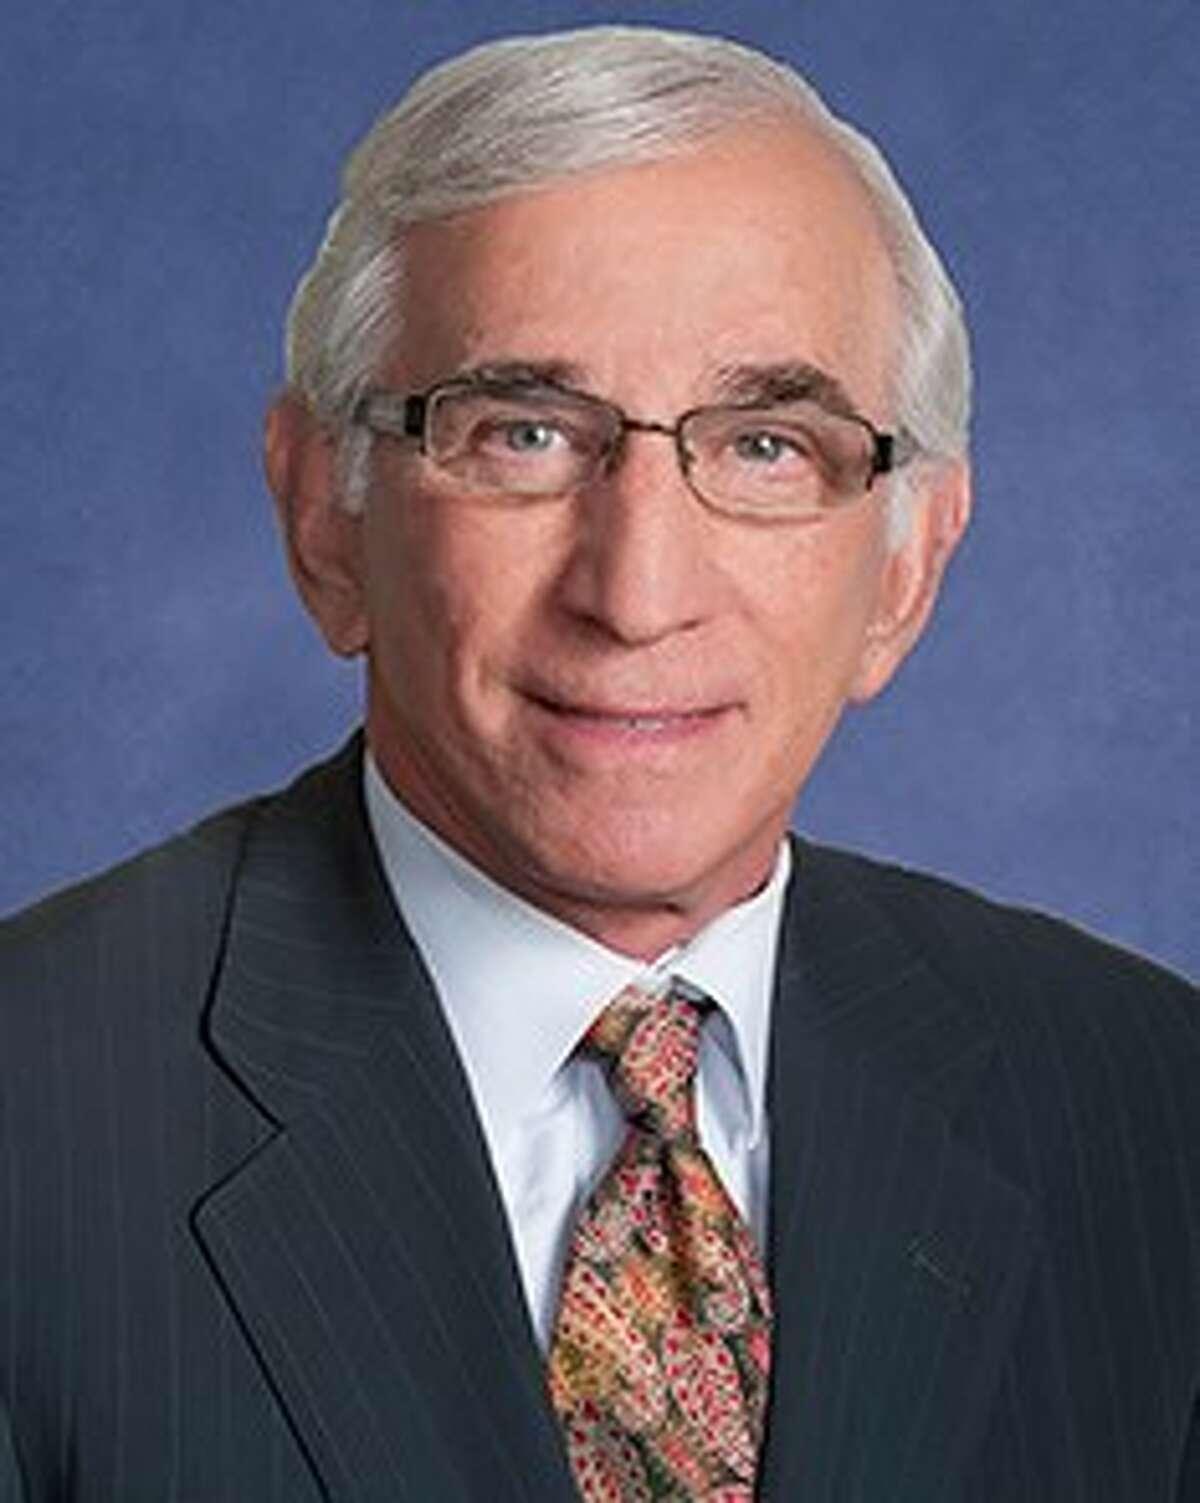 Herb Weitzman, founder of Weitzman Group